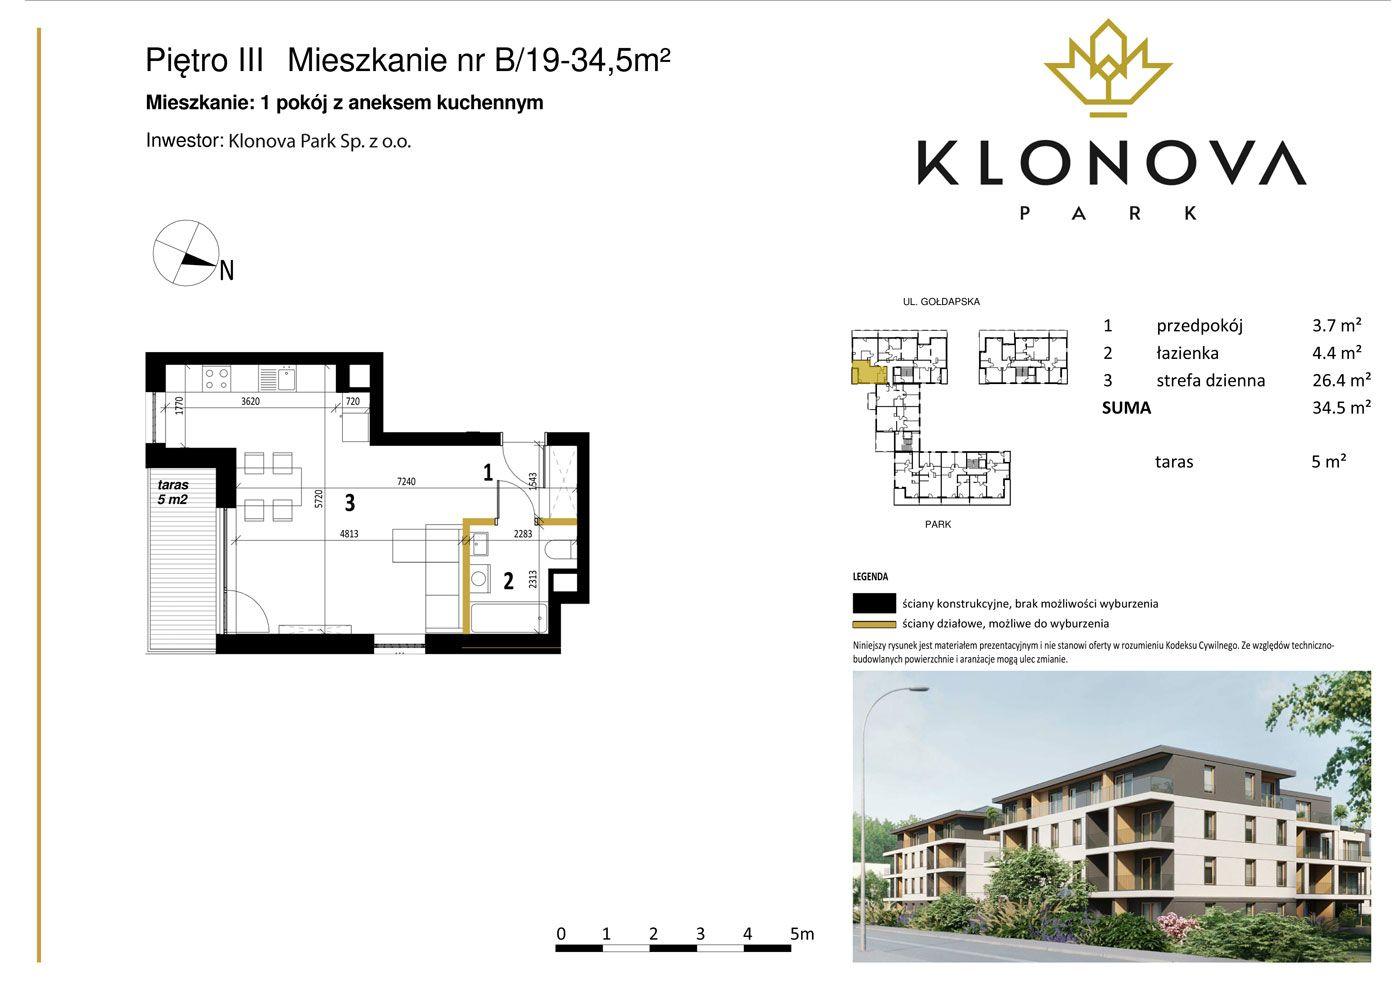 Apartamenty Klonova Park - Plan mieszkania B/19